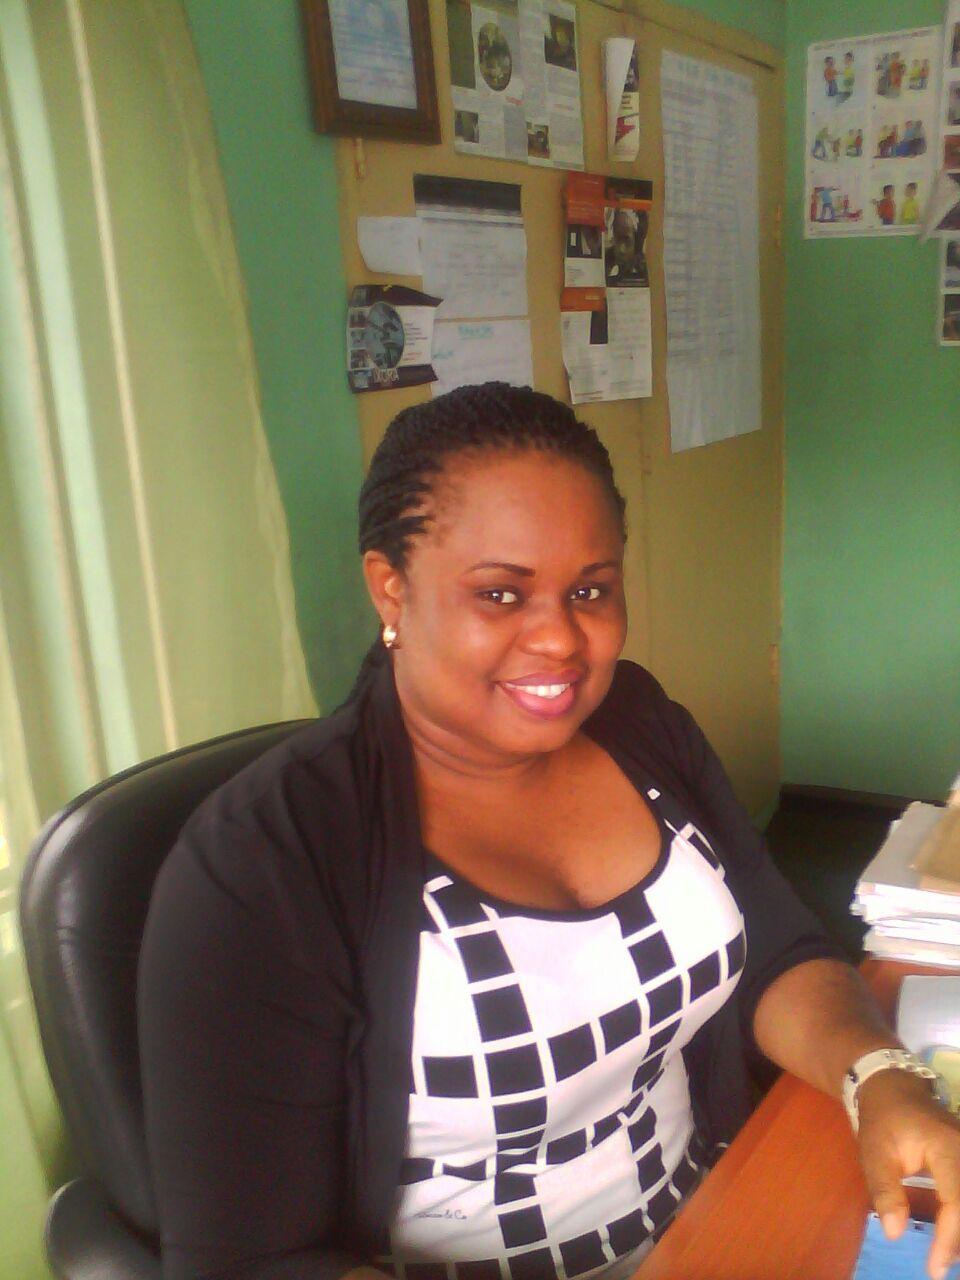 Ekaette at the office